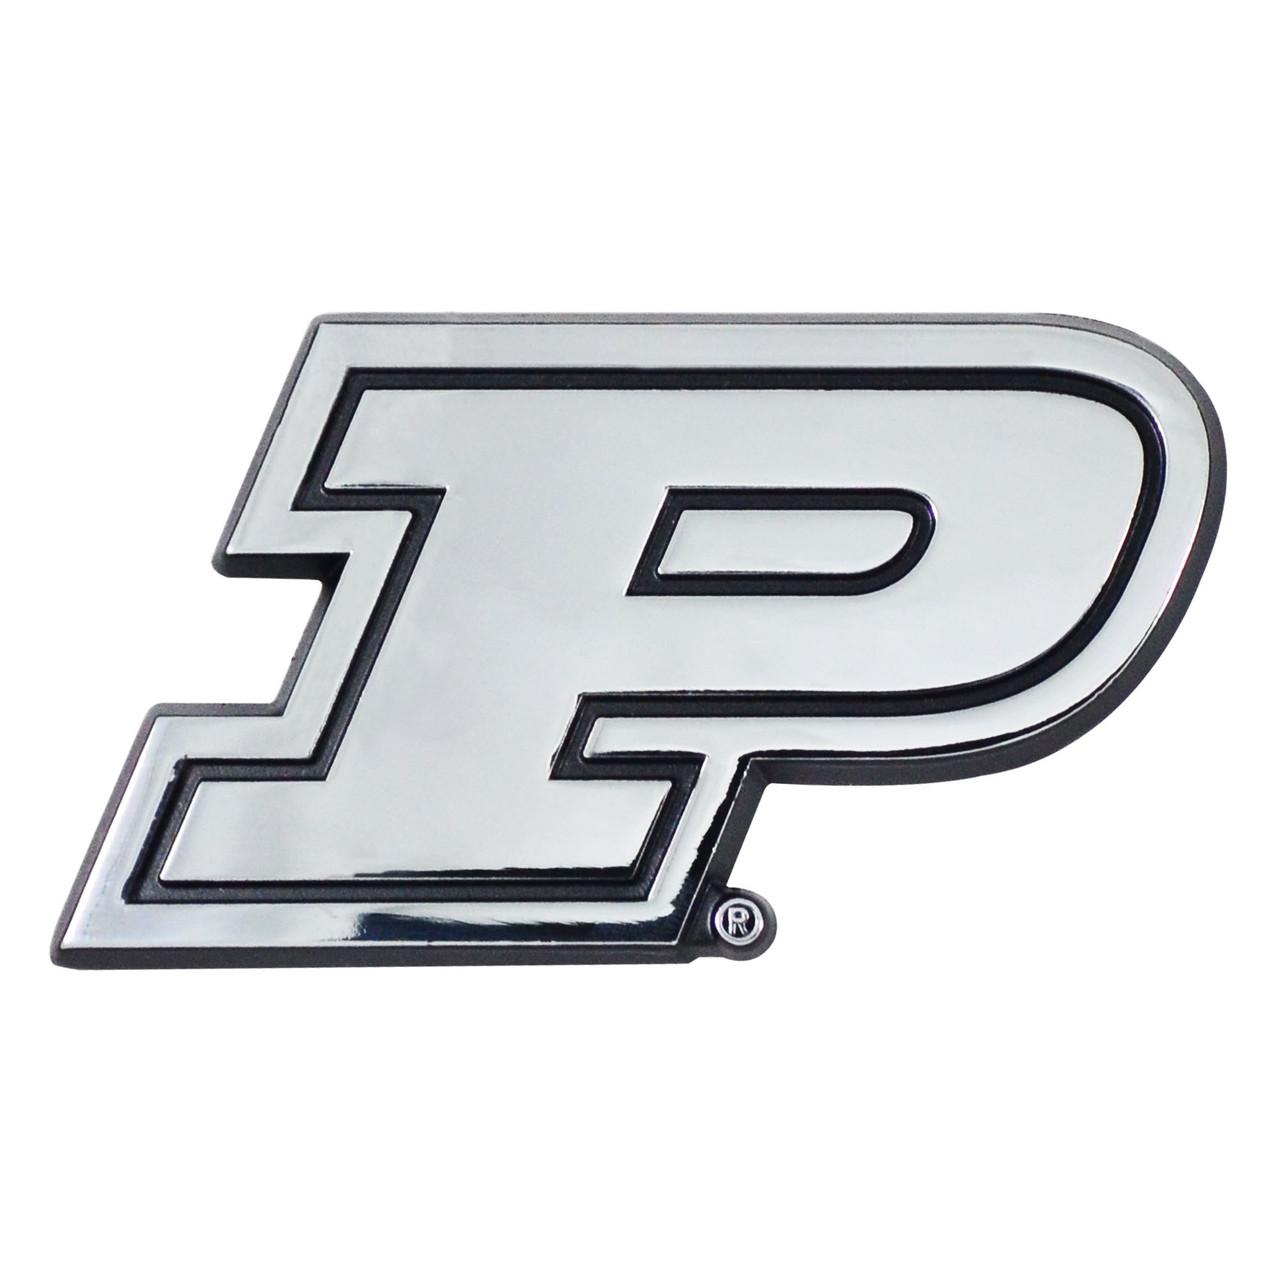 Purdue Boilermakers Auto Emblem Premium Metal Chrome Special Order